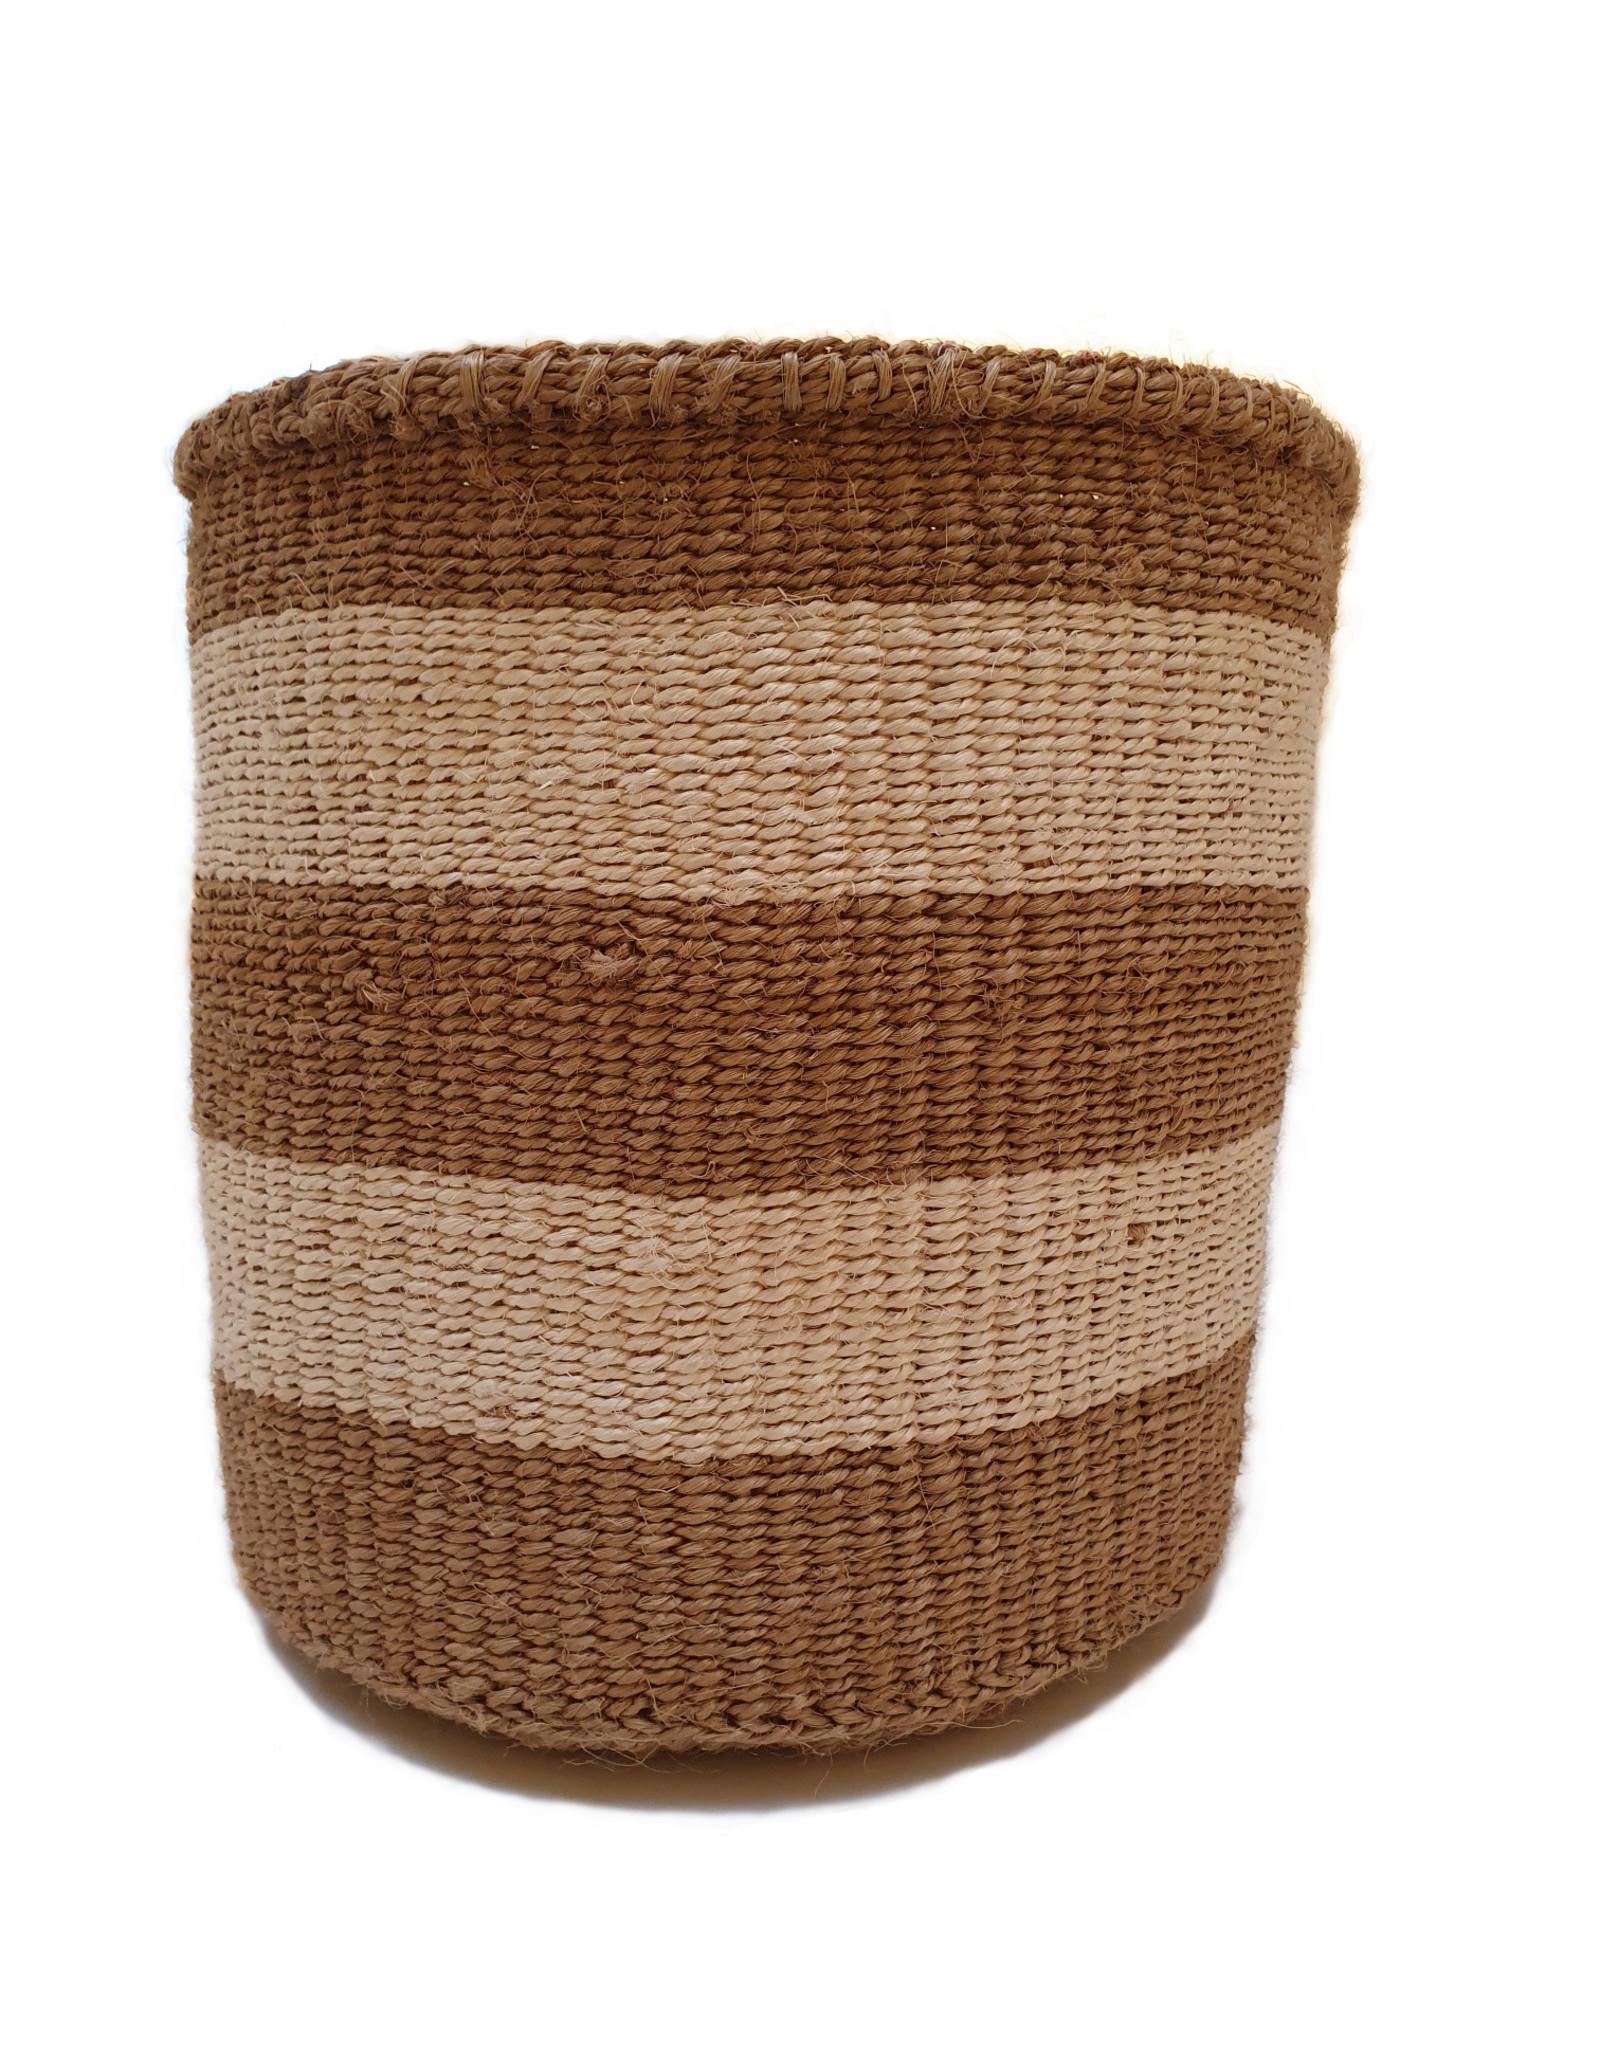 Maisha.Style Taita basket - ivory & reed stripes - M/L5